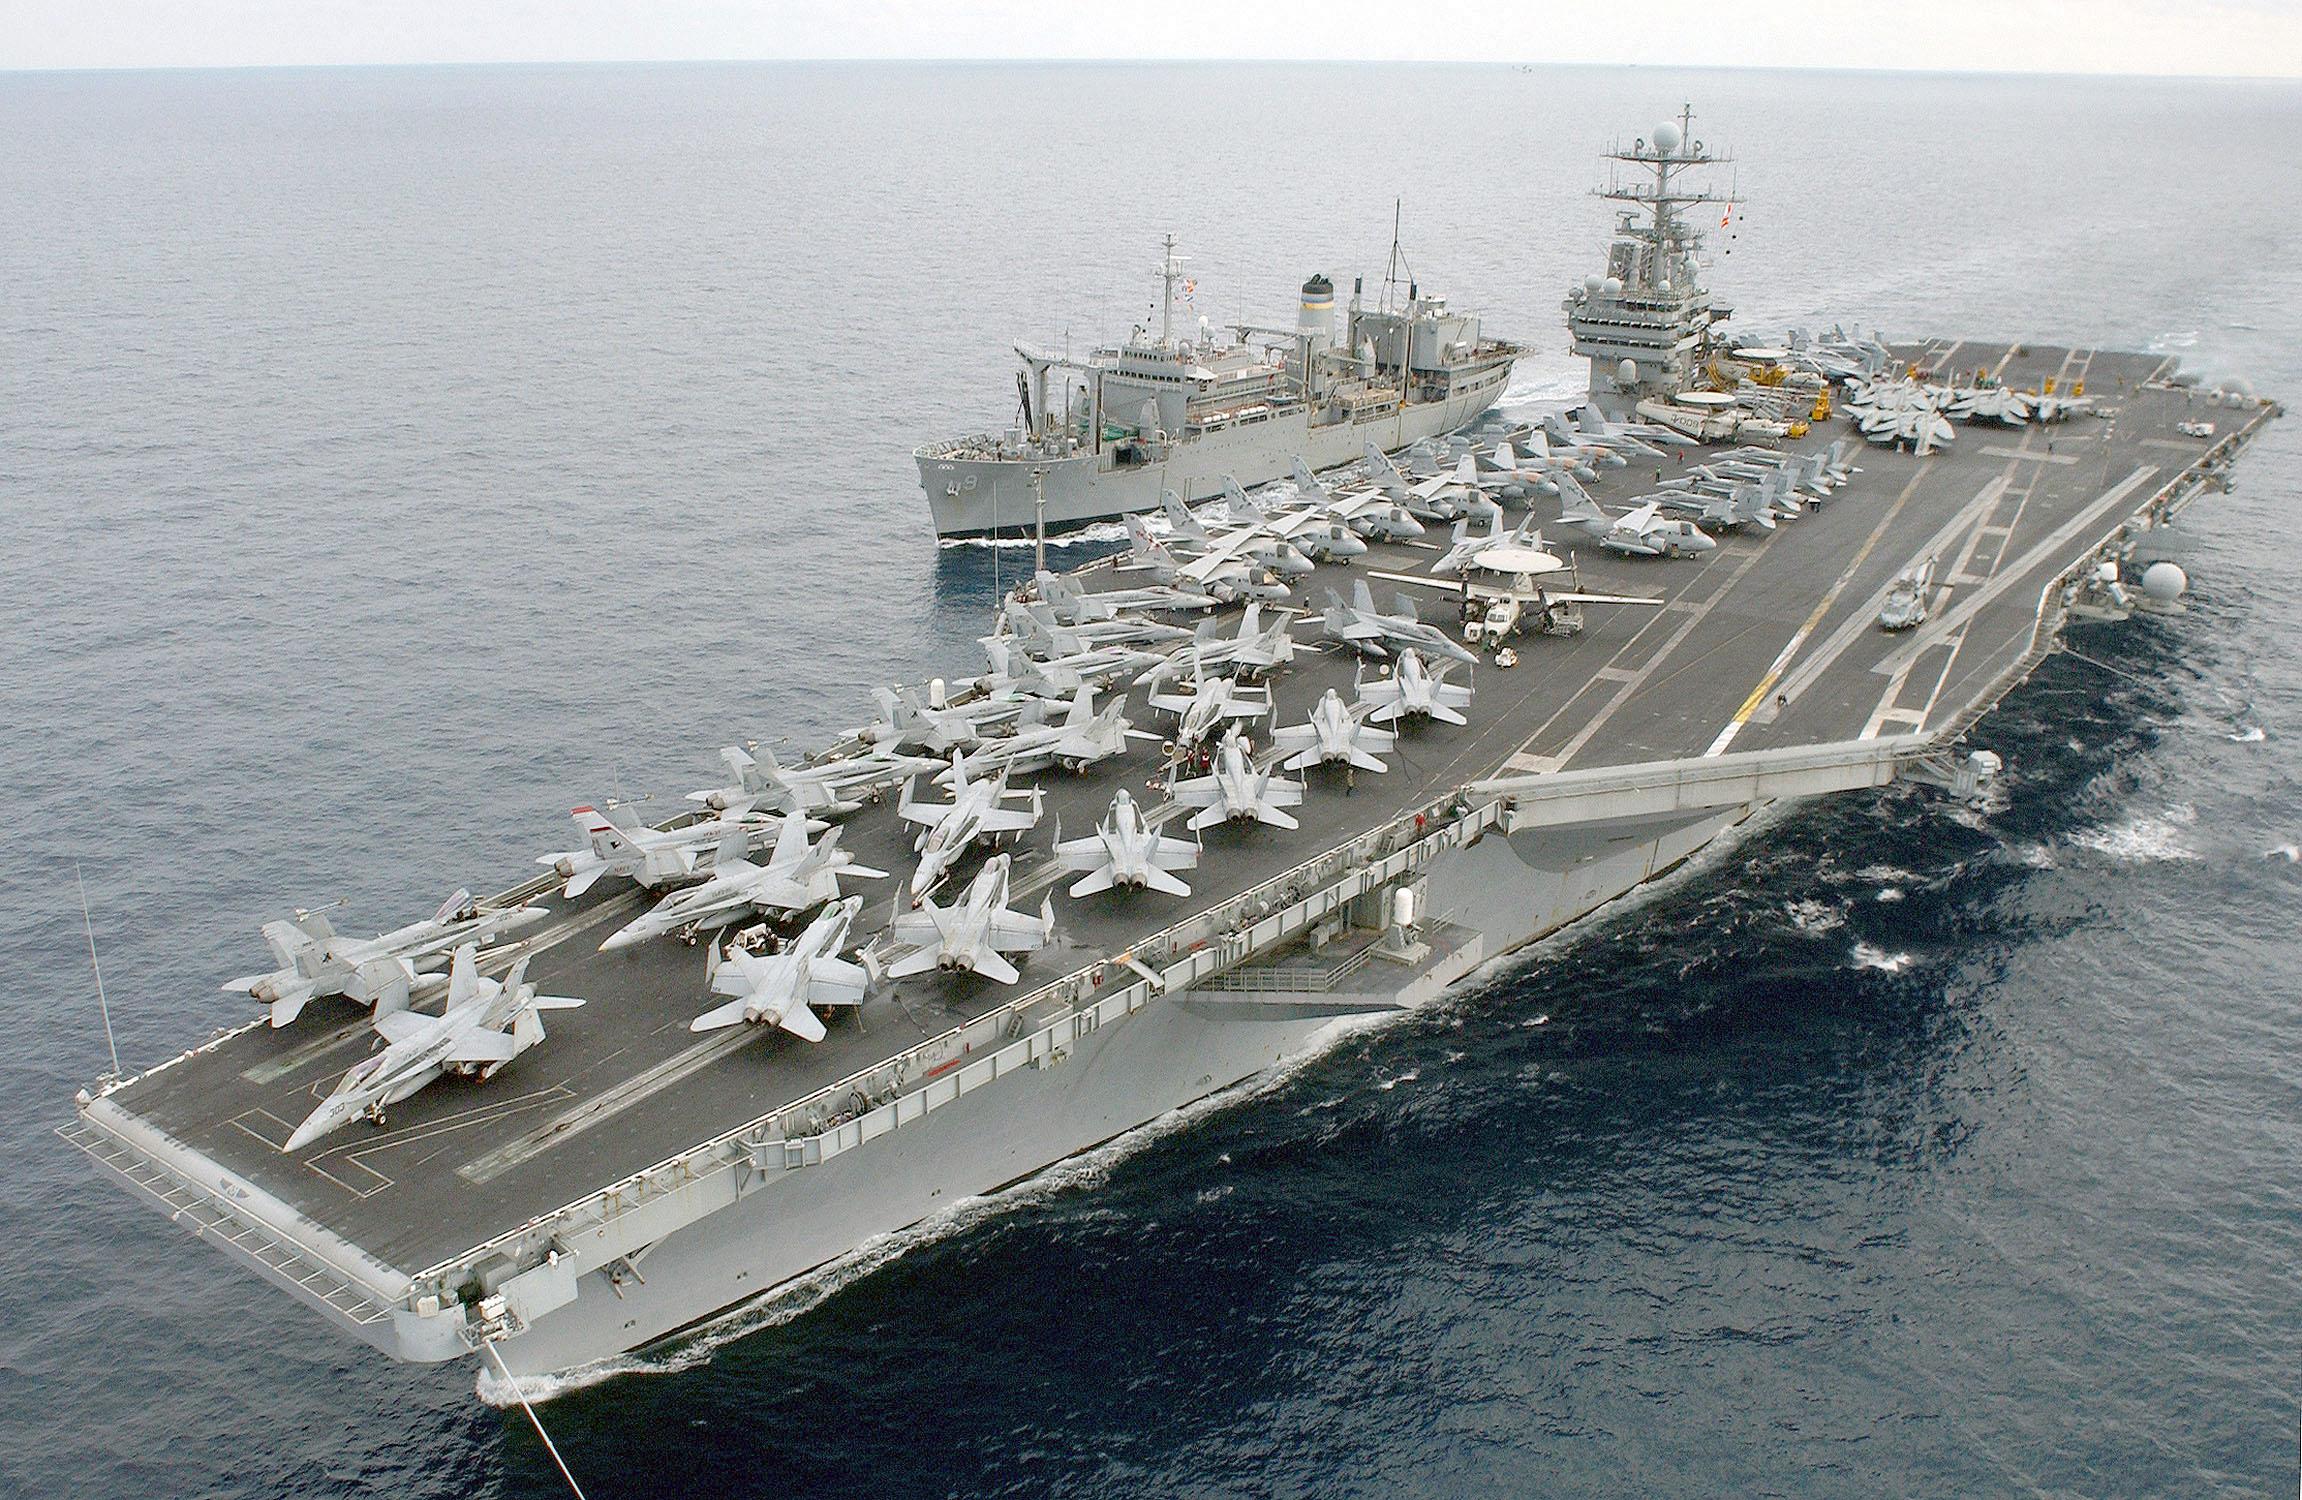 US_Navy_030117-N-9851B-027_The_Military_Sealift_Command_ship_USNS_Spica_(T-AFS_9).jpg